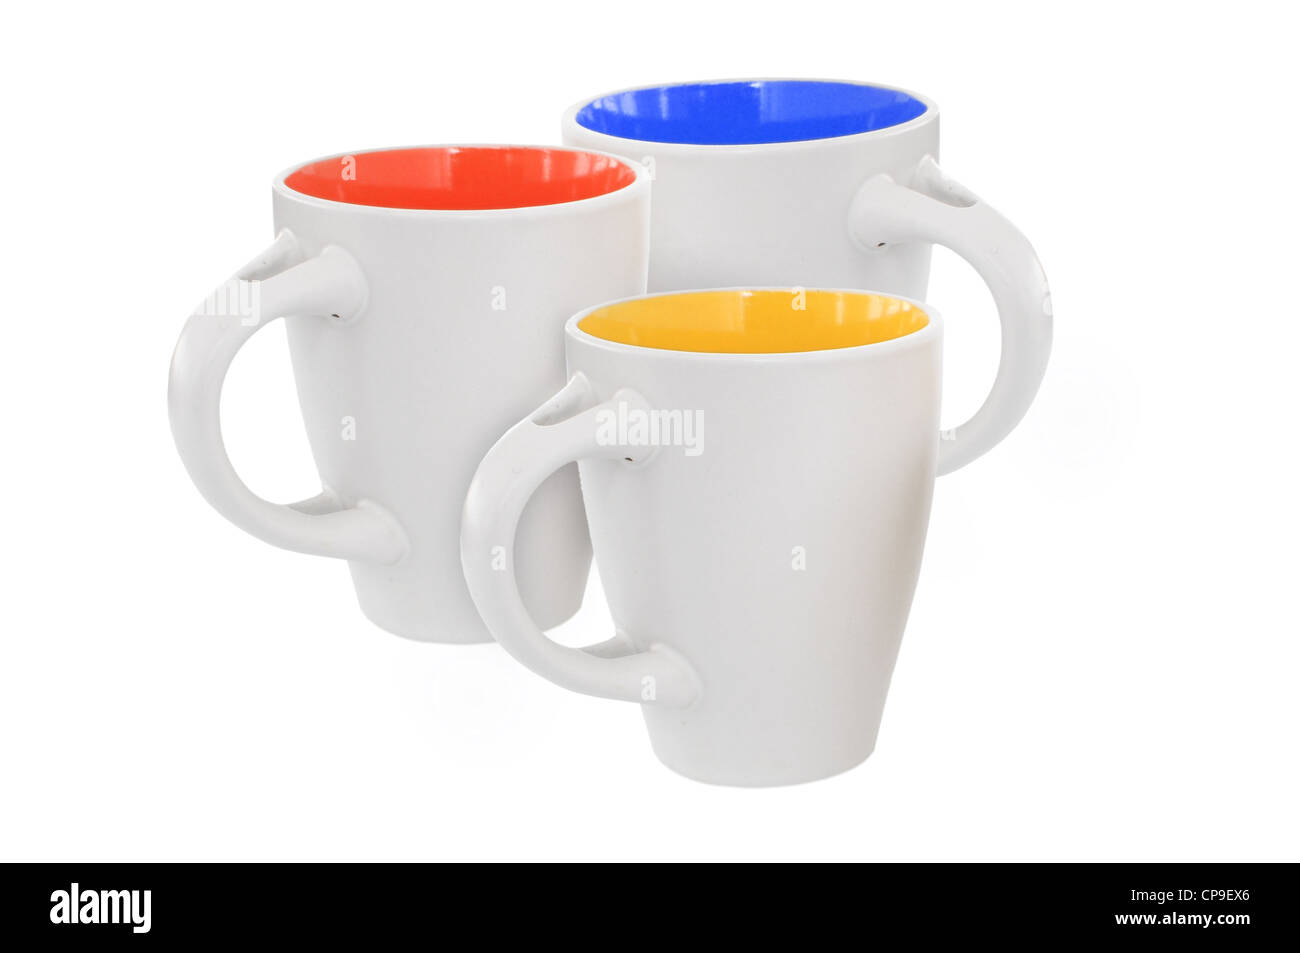 Three multicolored mugs, isolated on white - Stock Image